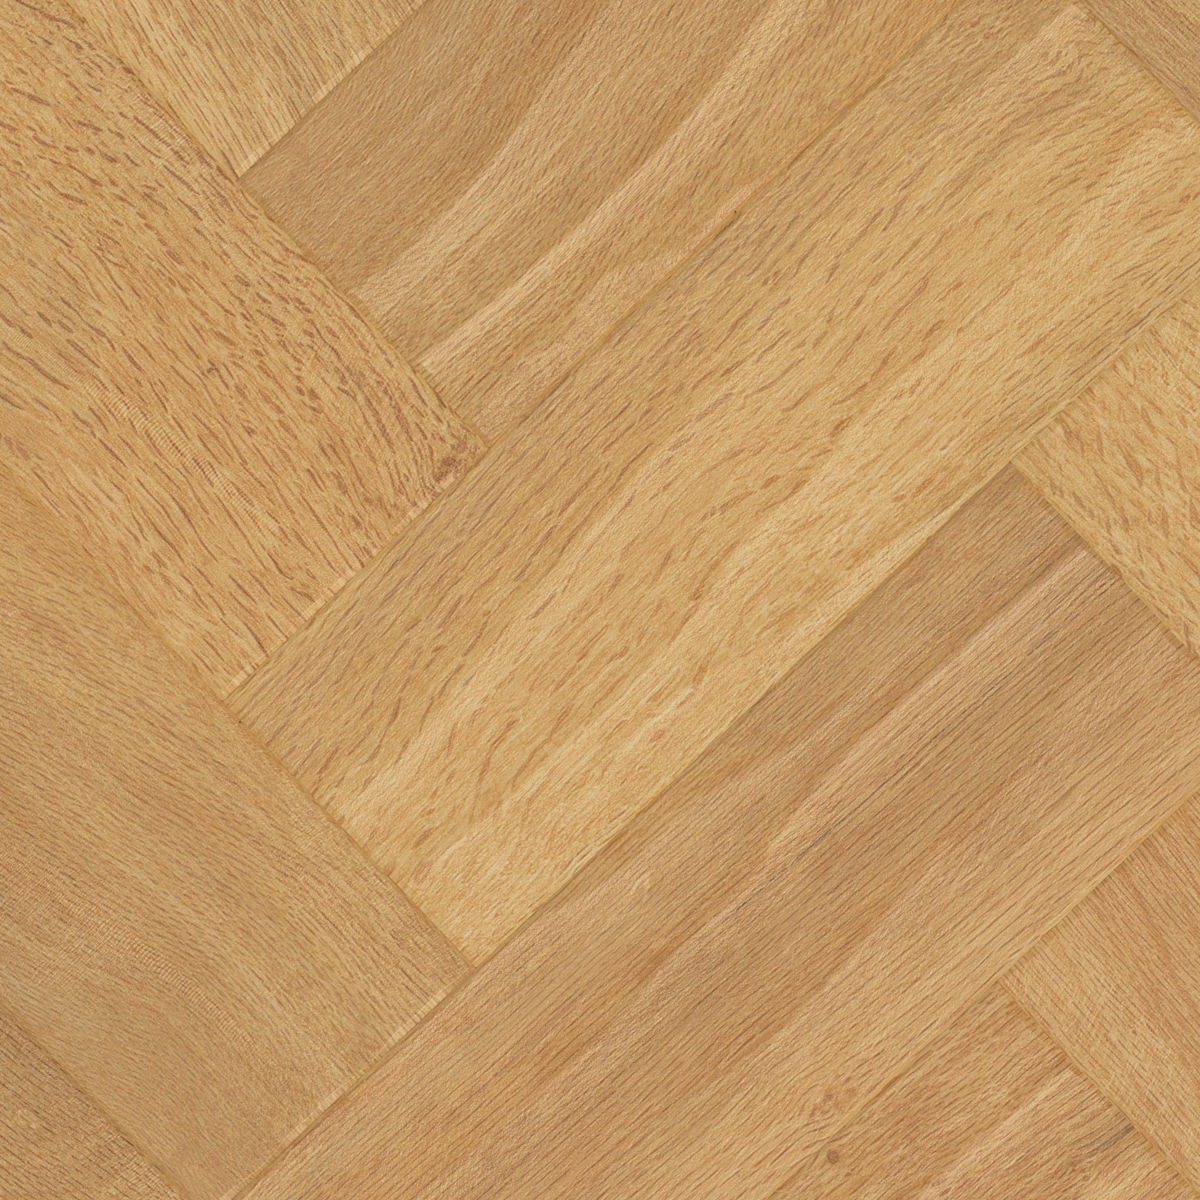 Karndean Art Select Blond Oak Parquet AP01 Vinyl Flooring